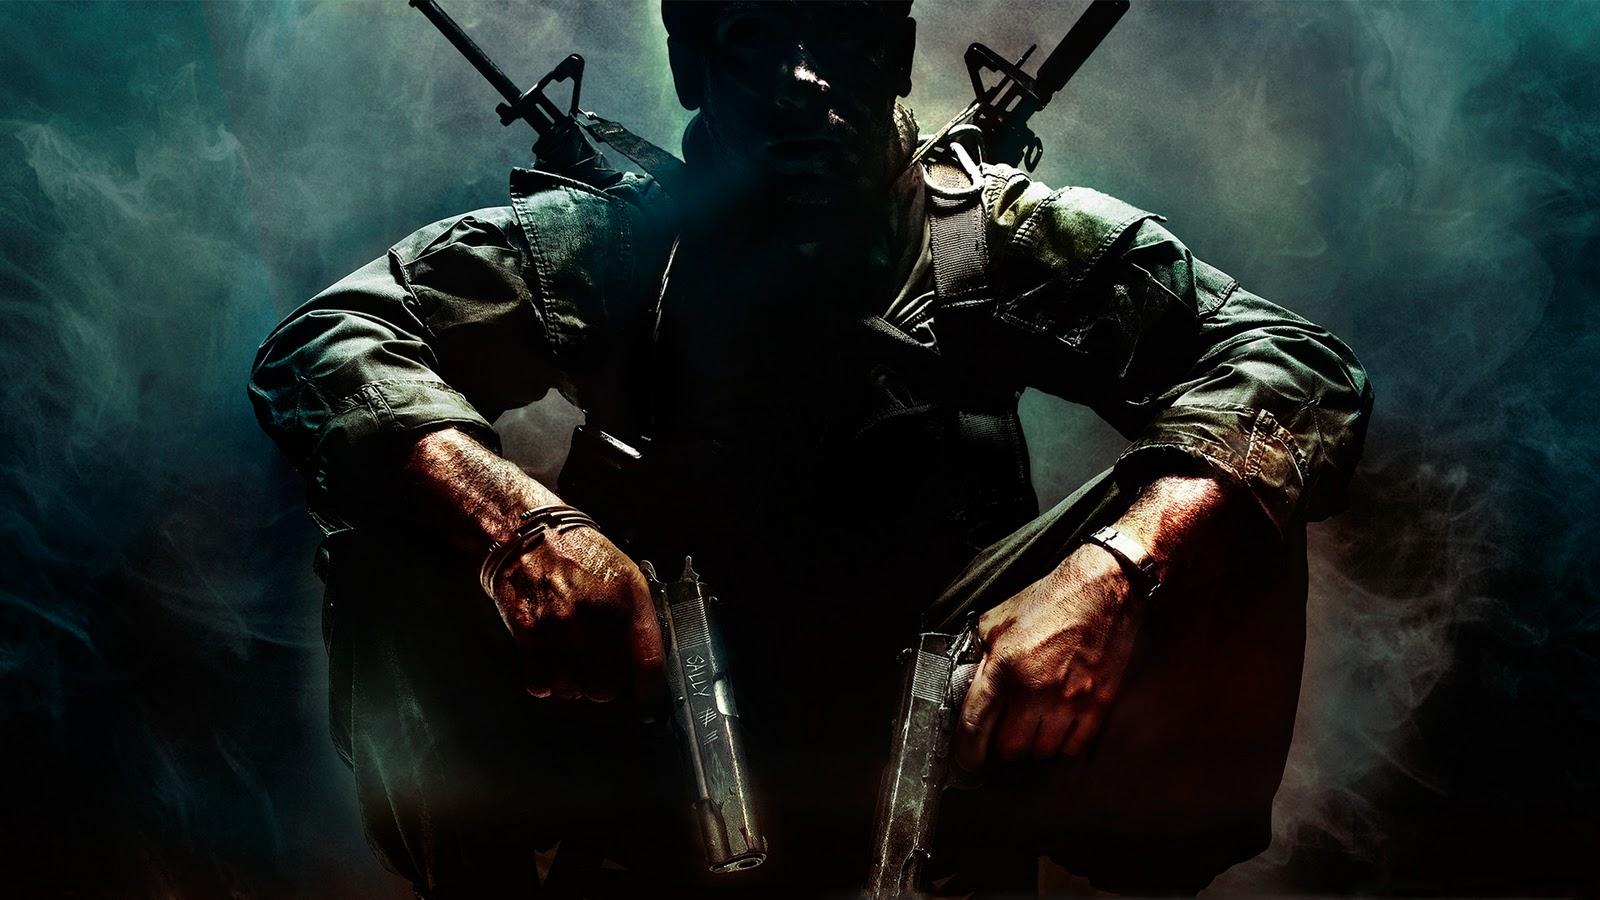 Call of Duty HD Wallpaper - WallpaperSafari